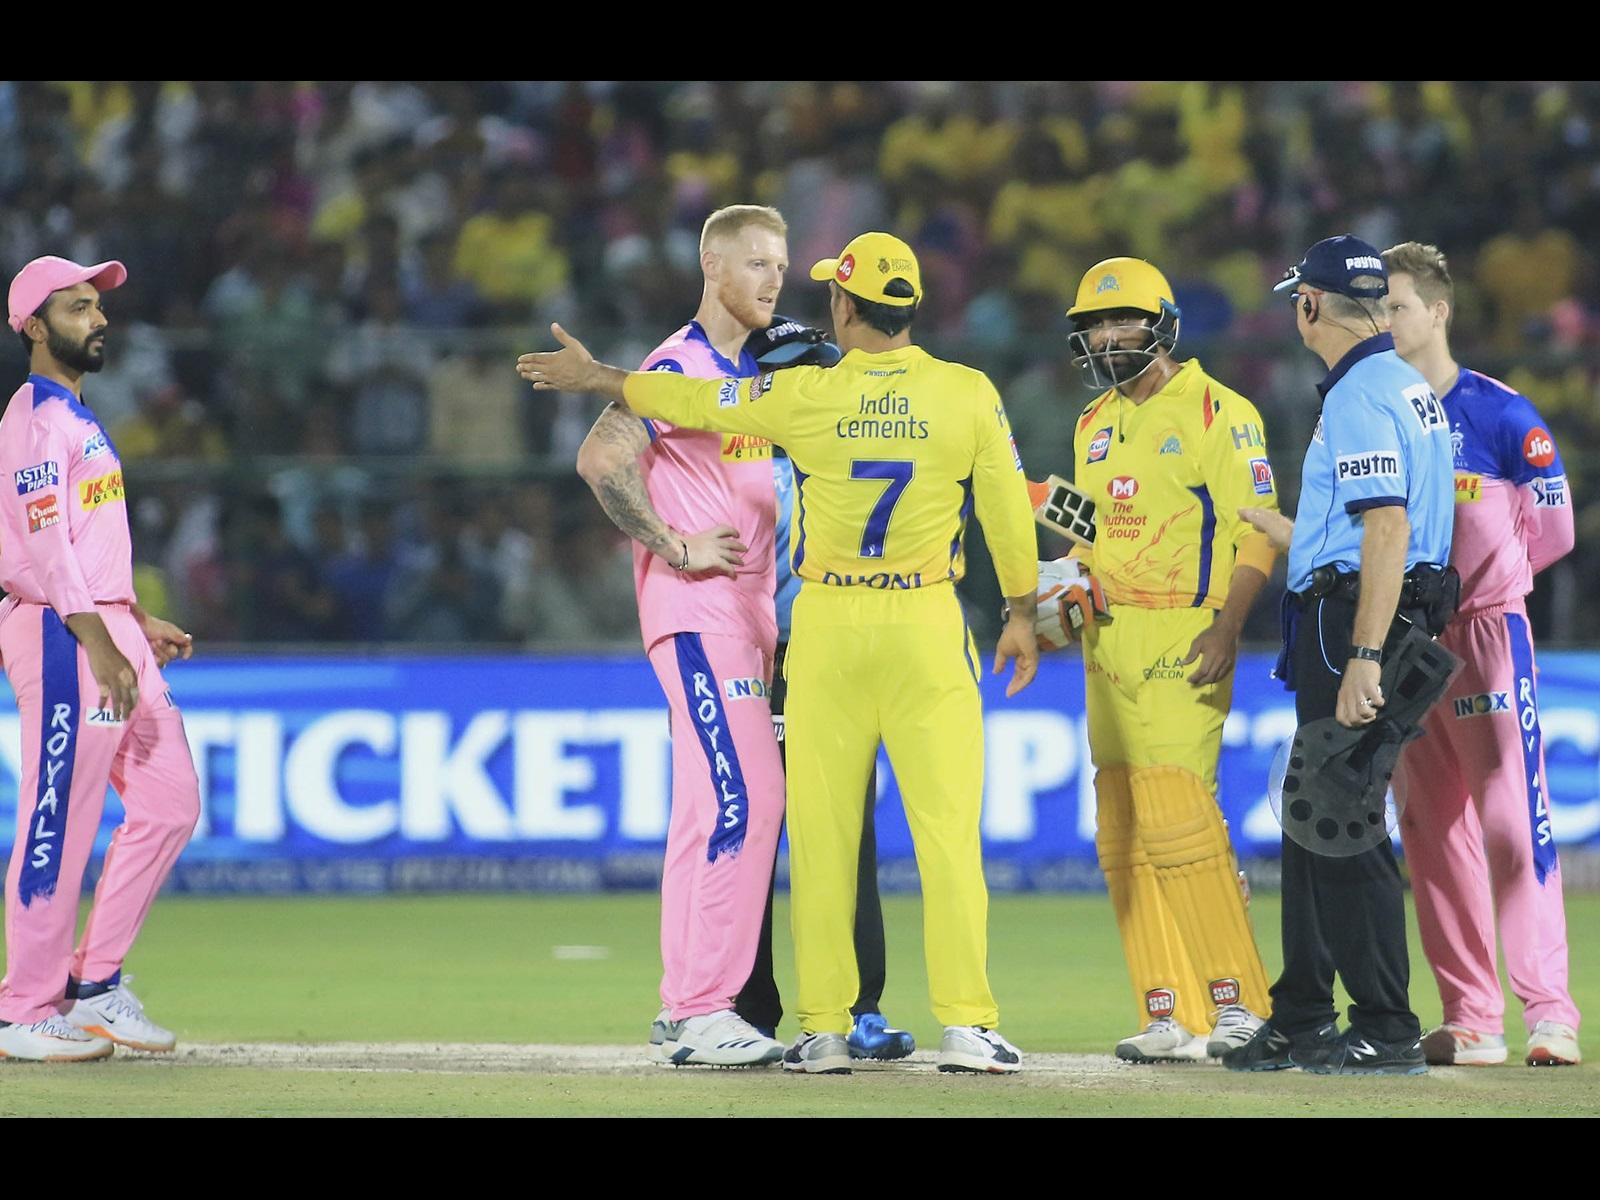 Dhoni fined following dramatic IPL clash | cricket.com.au